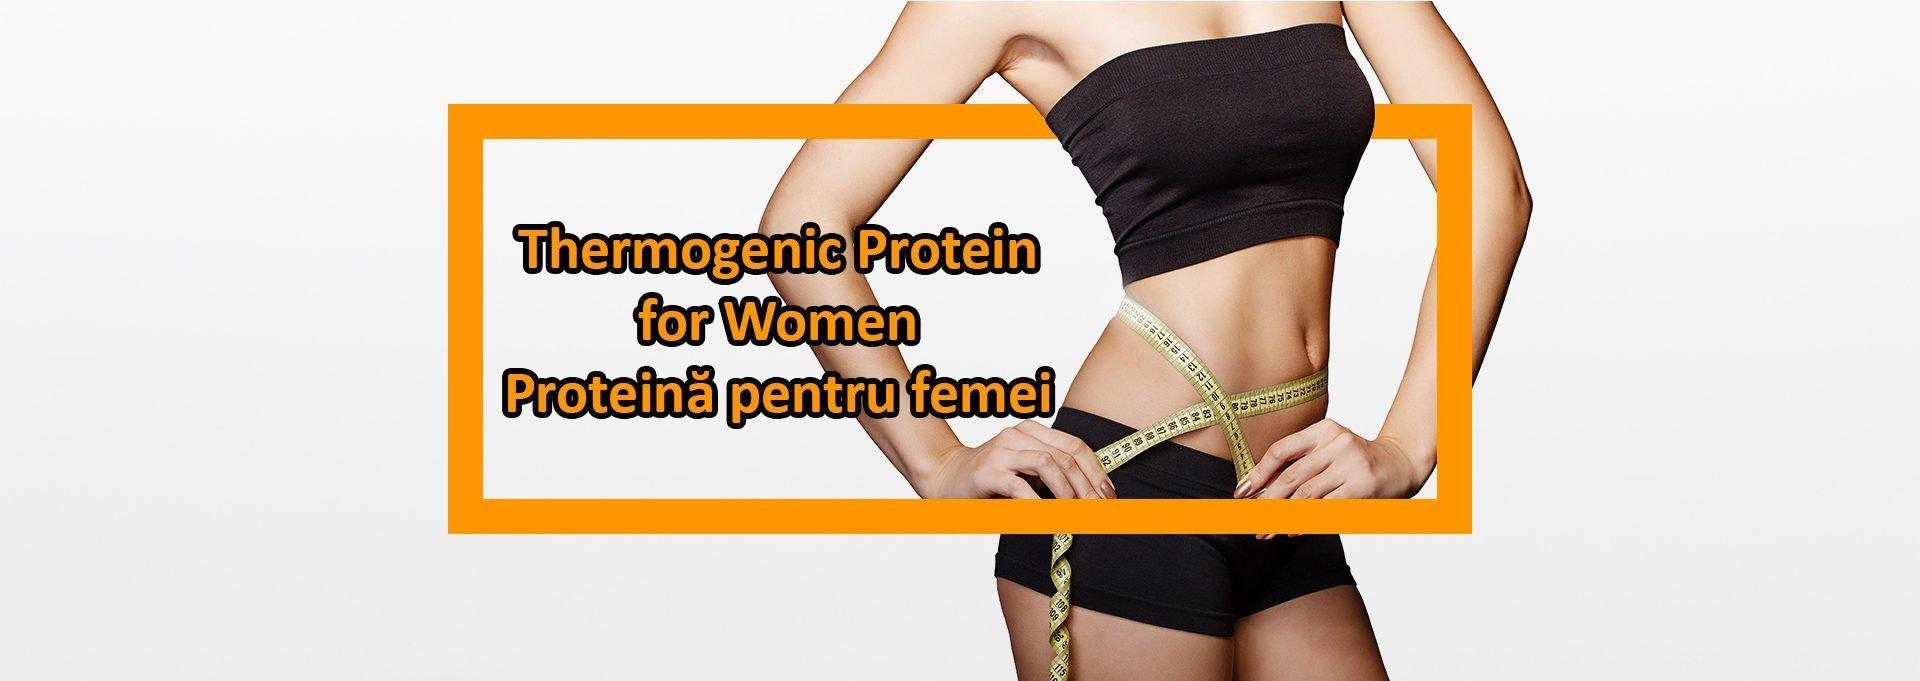 thermogenic protein women banner - proteina pentru femei